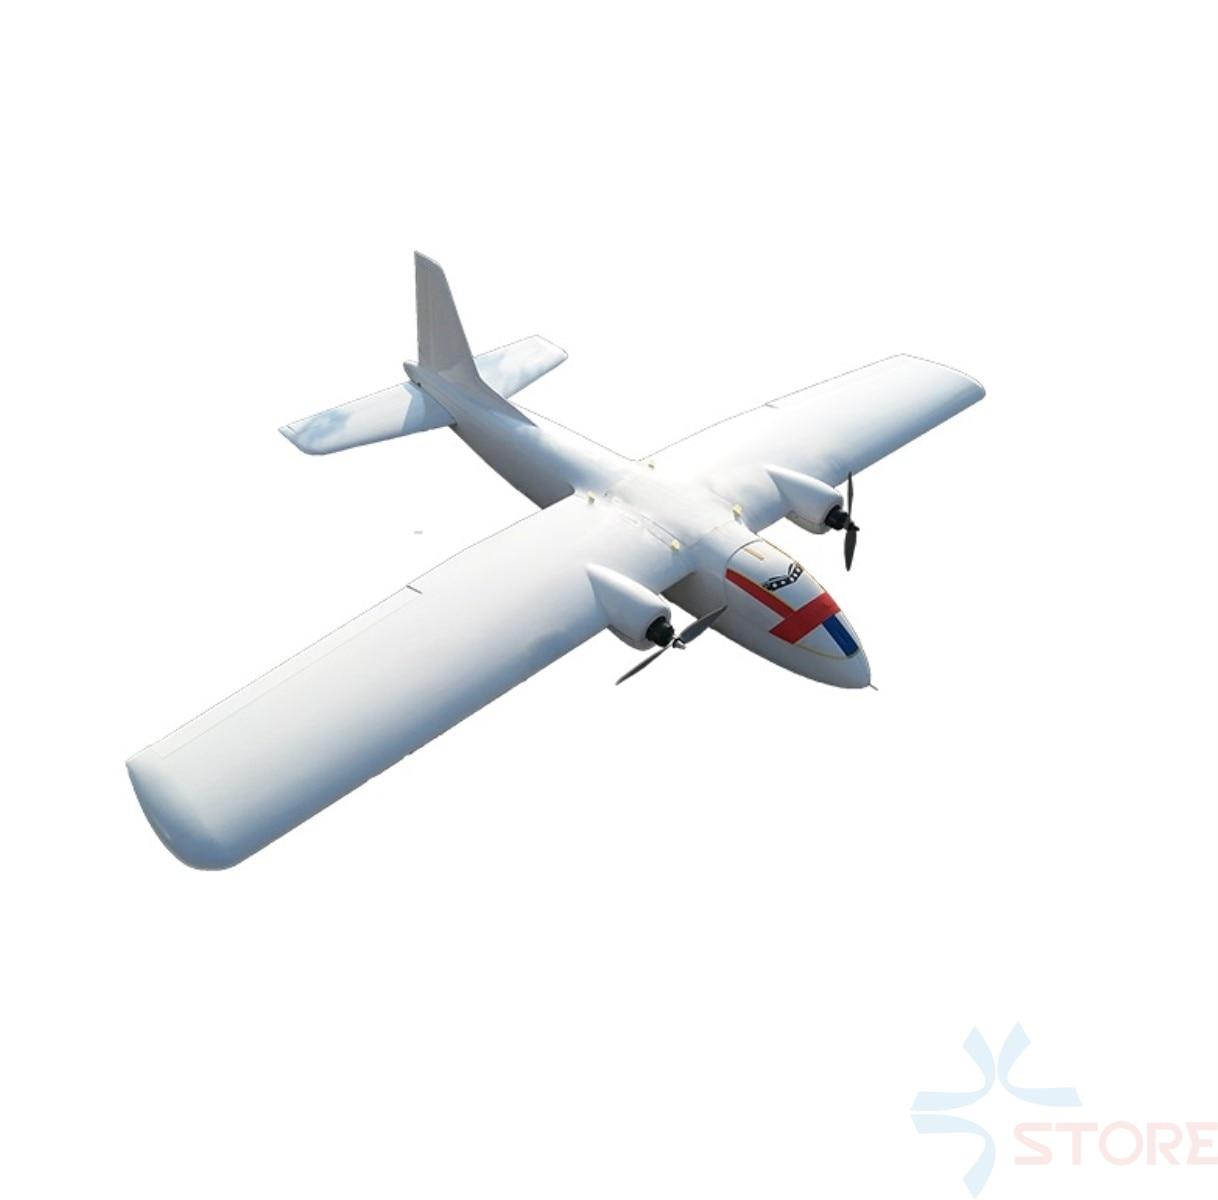 100KM Long Range My Twin Dream MTD FPV 1800mm UAV Wingspan EPO Foam Flying Wing RC Airplane Kit100KM Long Range My Twin Dream MTD FPV 1800mm UAV Wingspan EPO Foam Flying Wing RC Airplane Kit